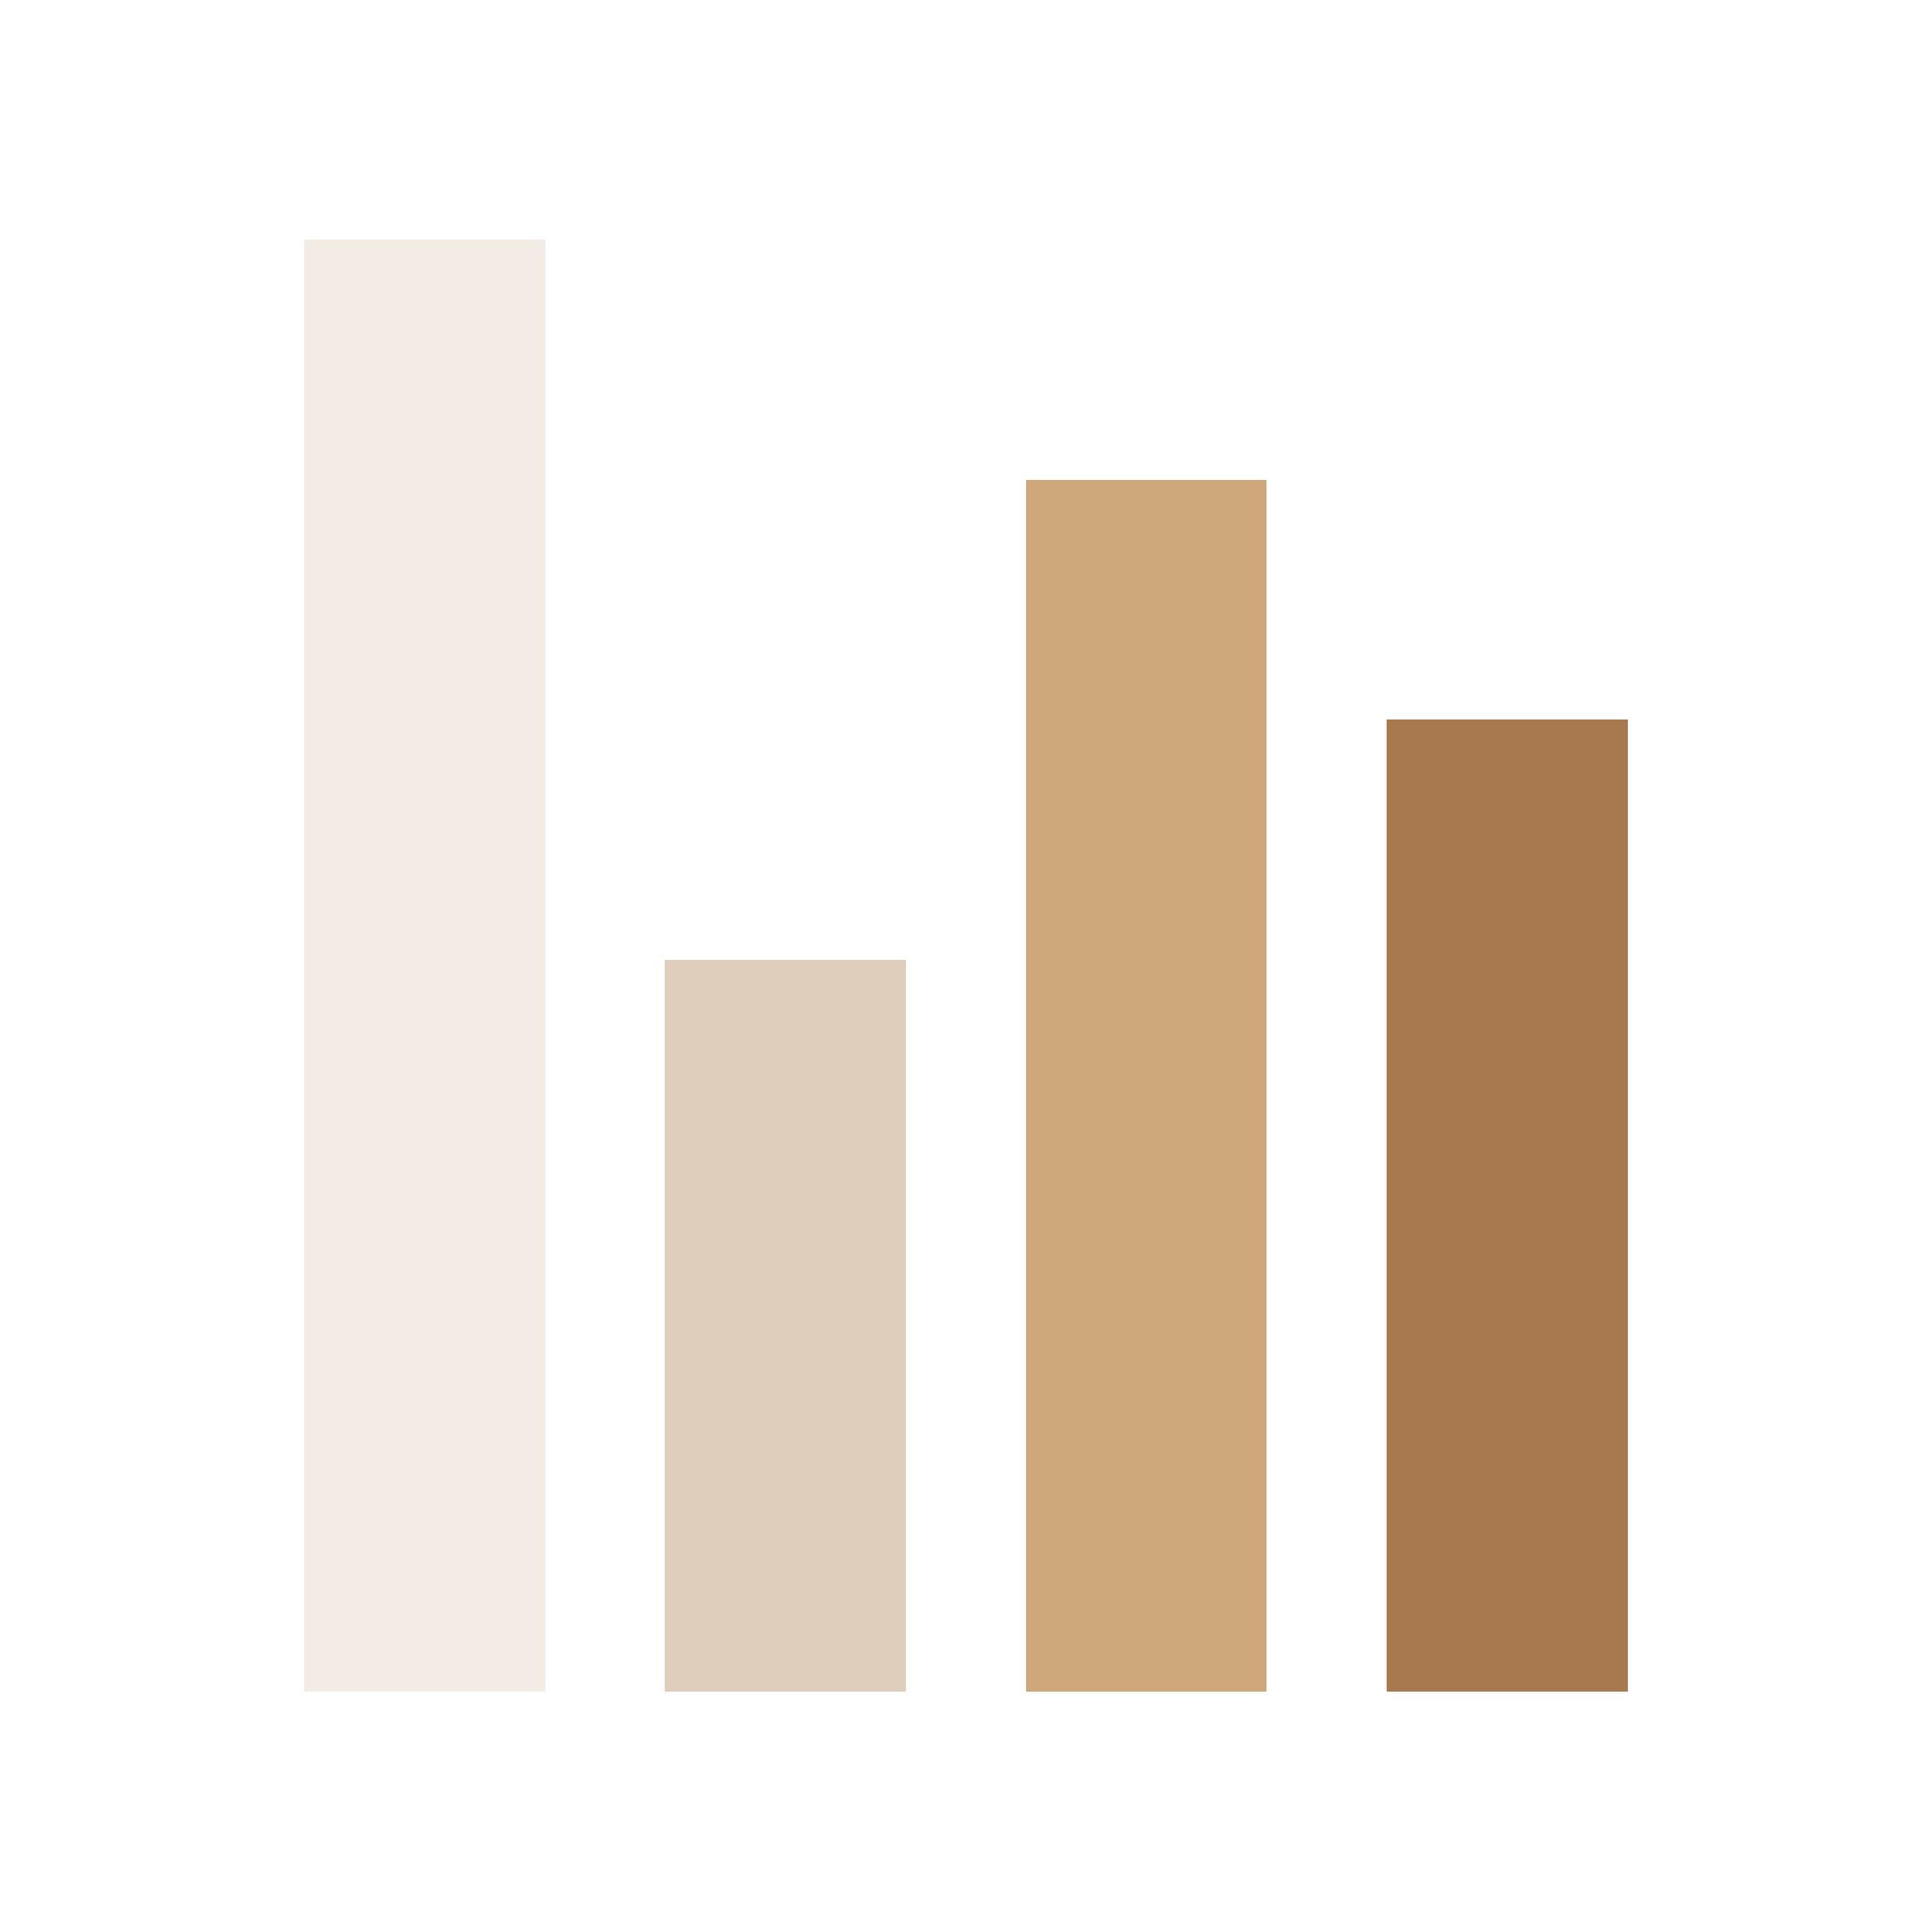 Live statistics and KPI analysis icon